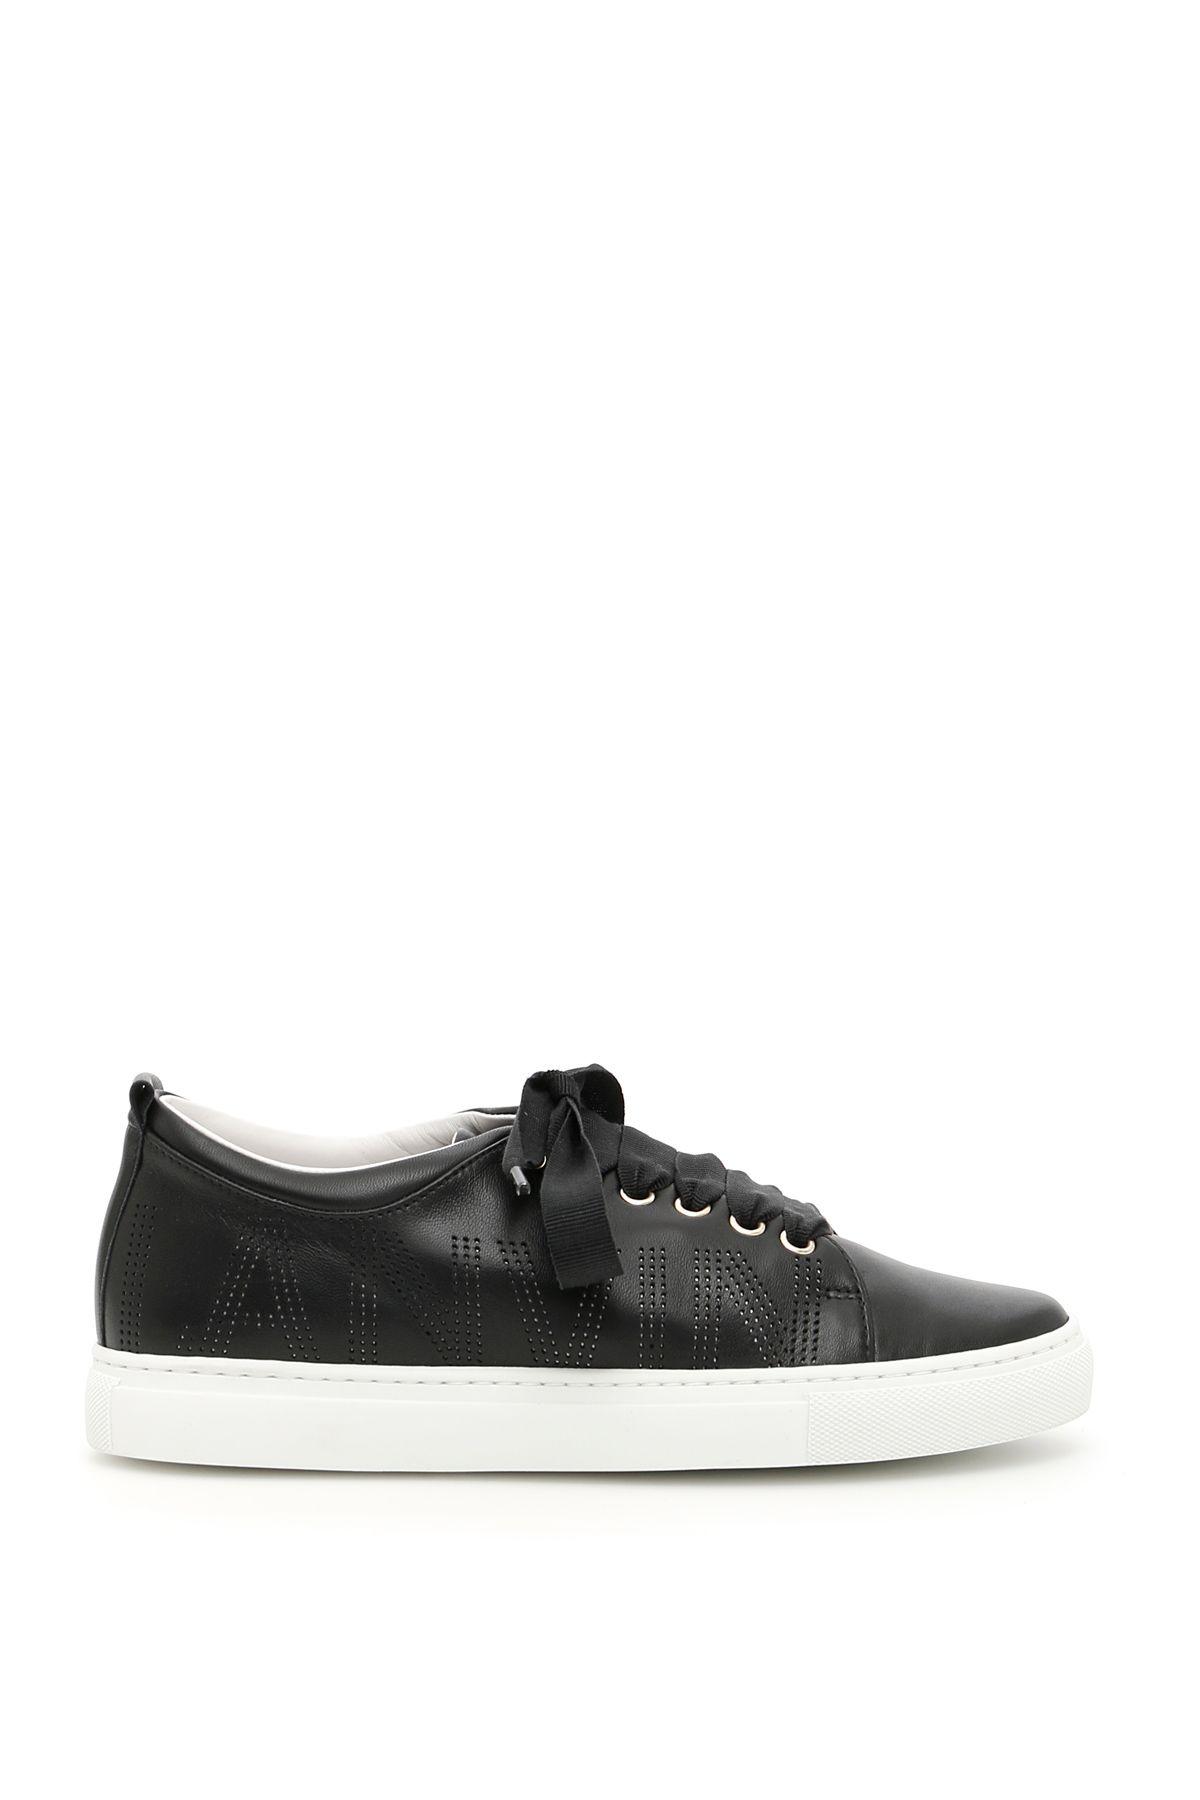 Lanvin Lanvin Logo Sneakers - BLACK|Nero - 10539412 | italist